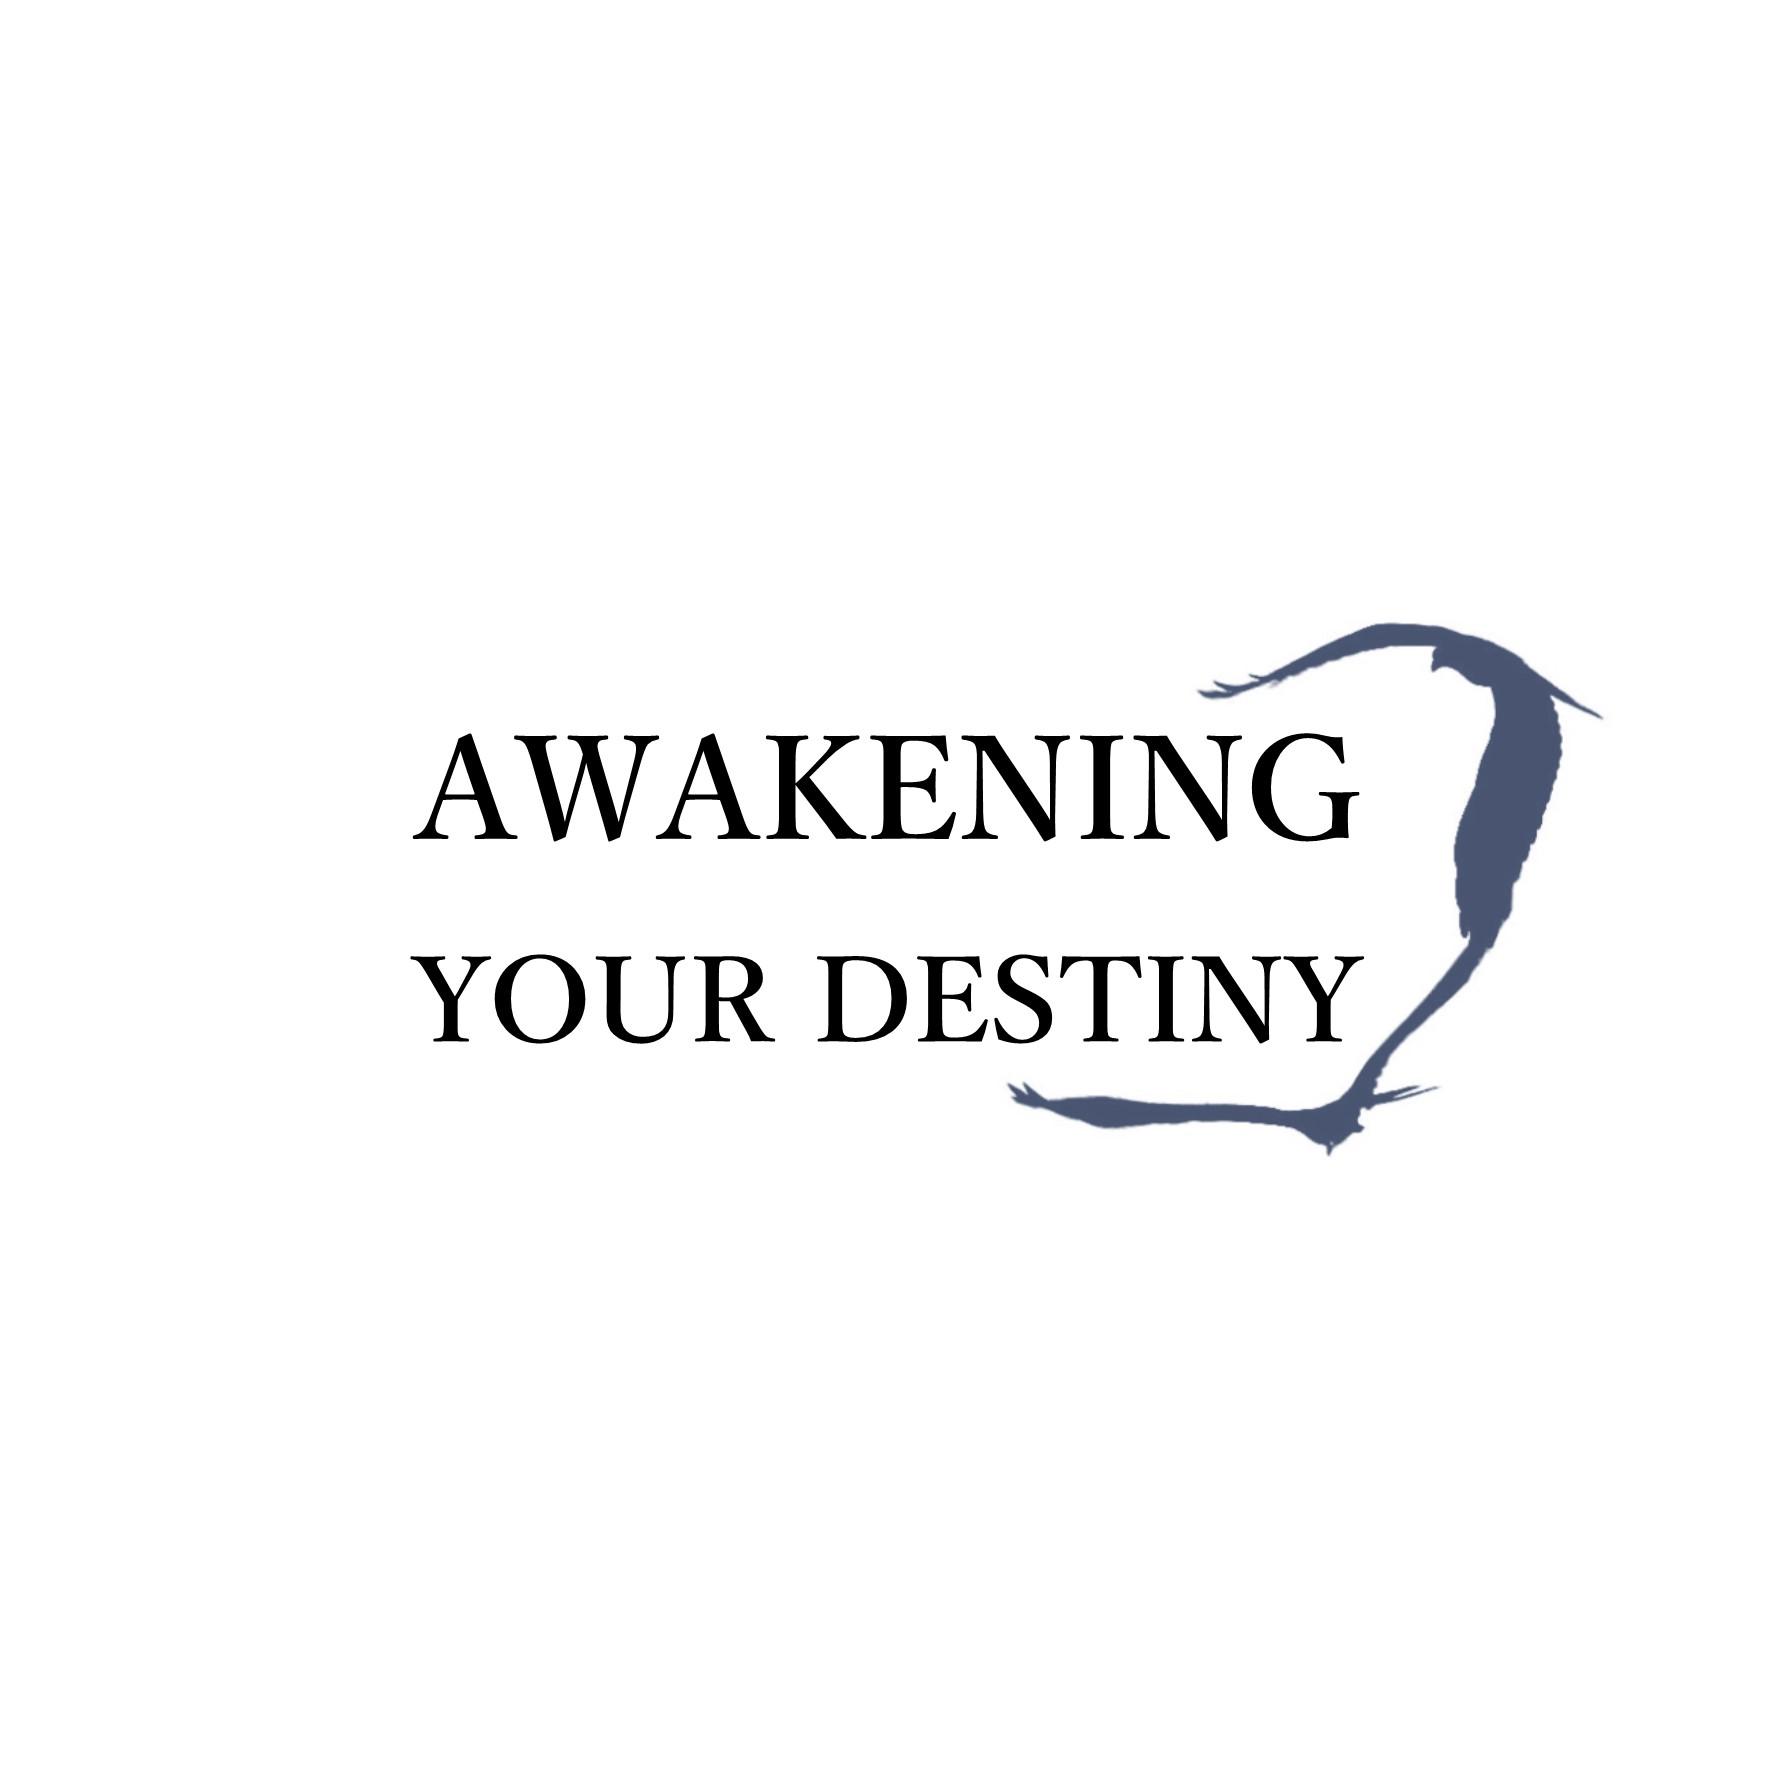 Holistic Healing Coaching Awakening Your Destiny